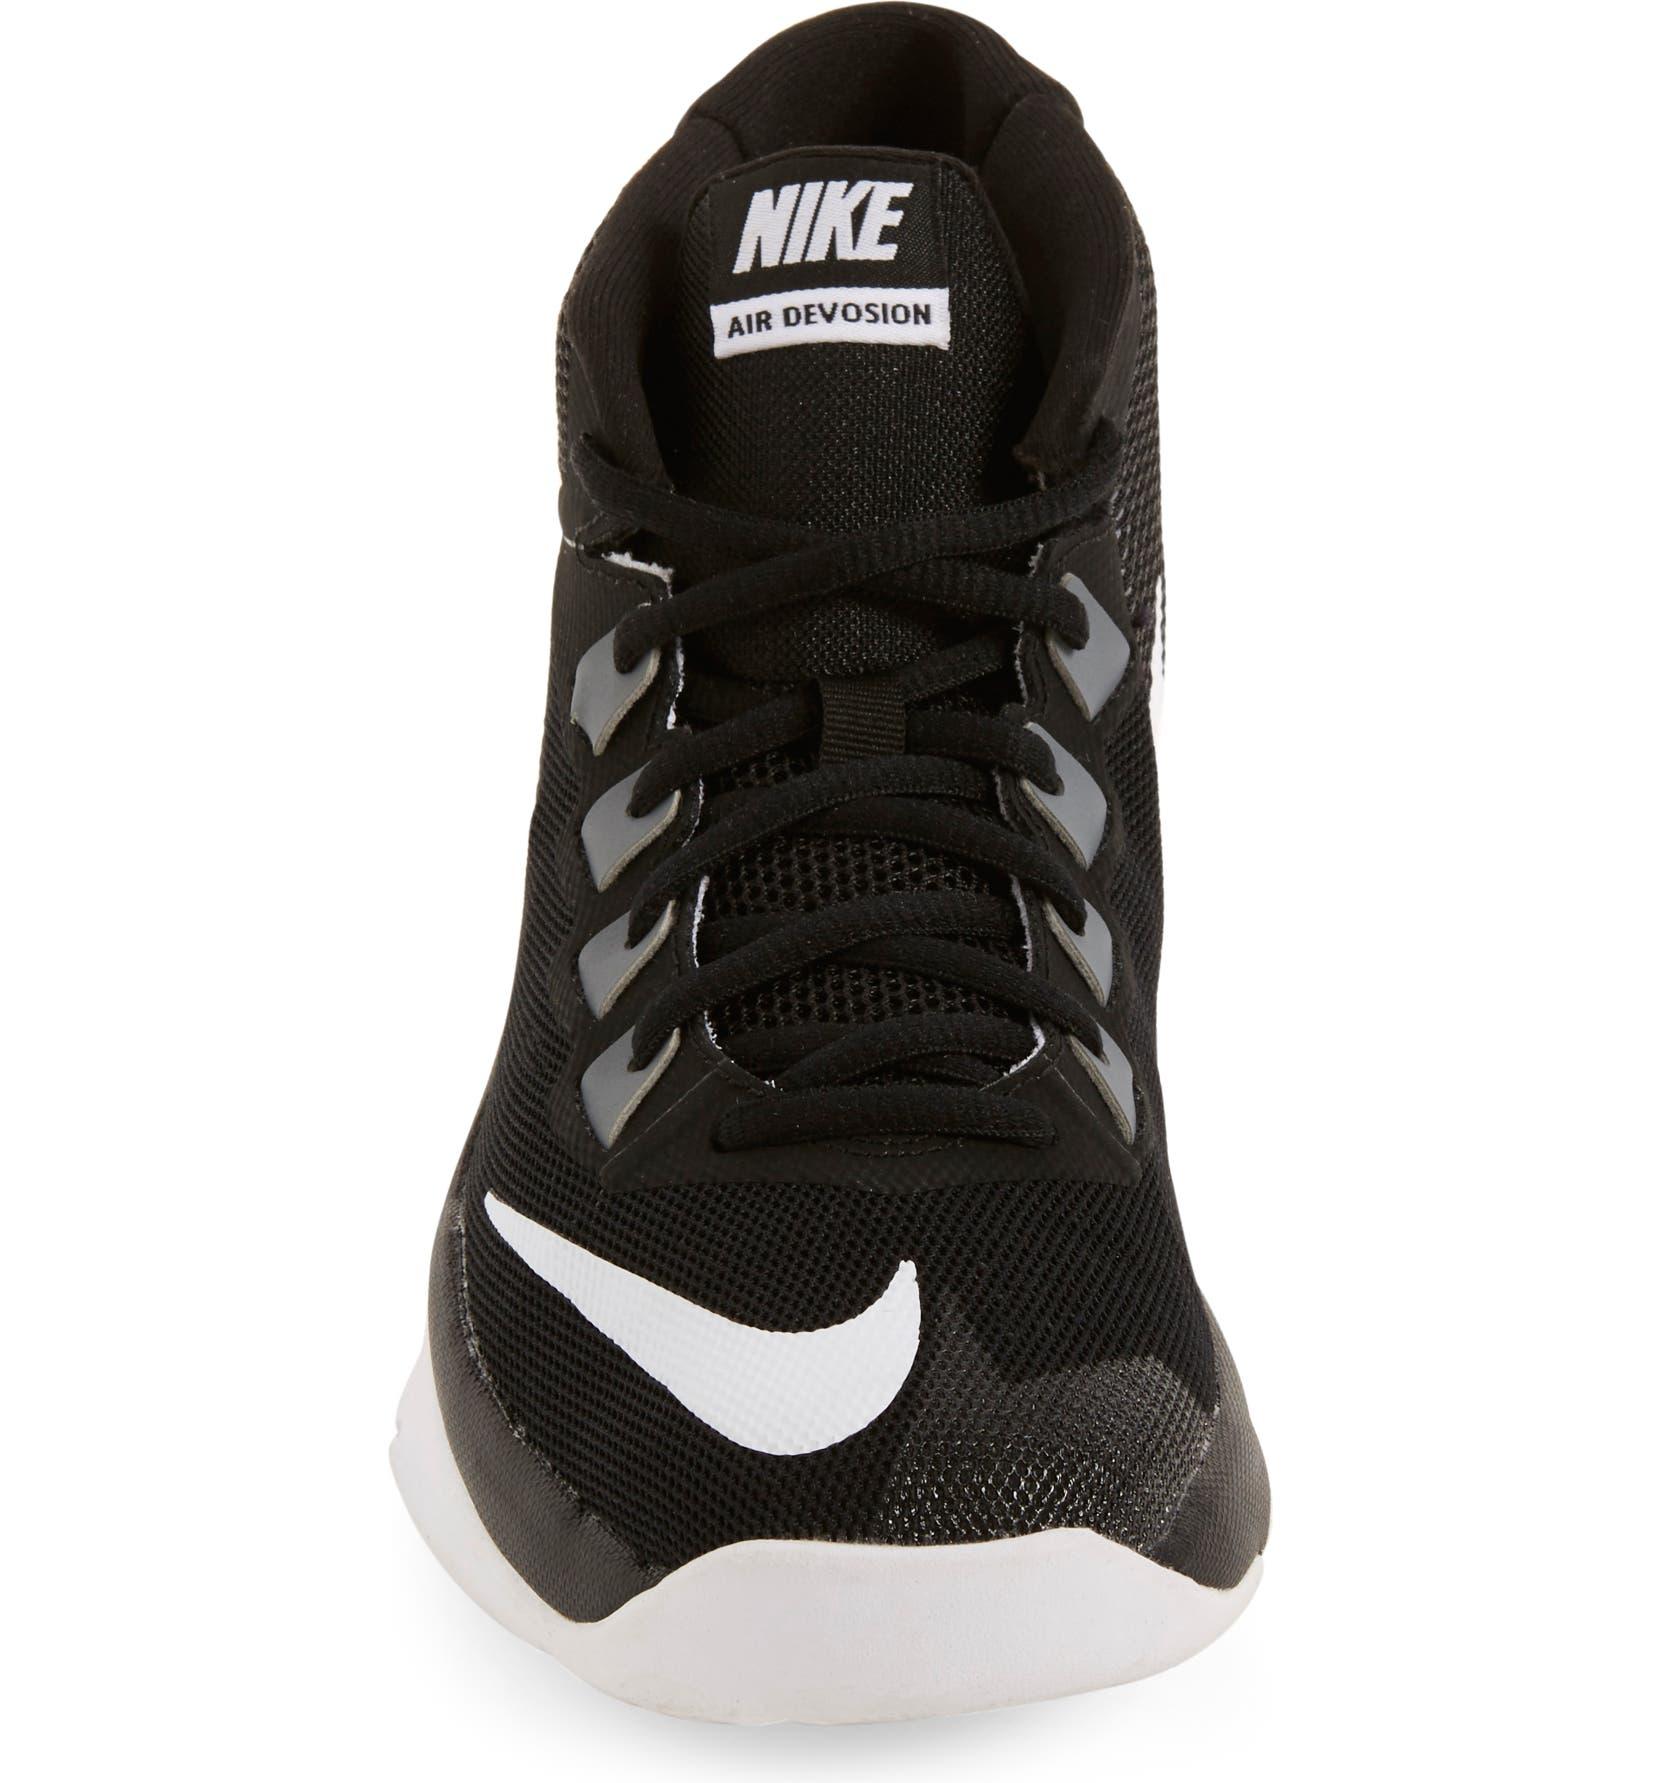 9958168258b8 Nike  Air Devosion  Sneaker (Toddler